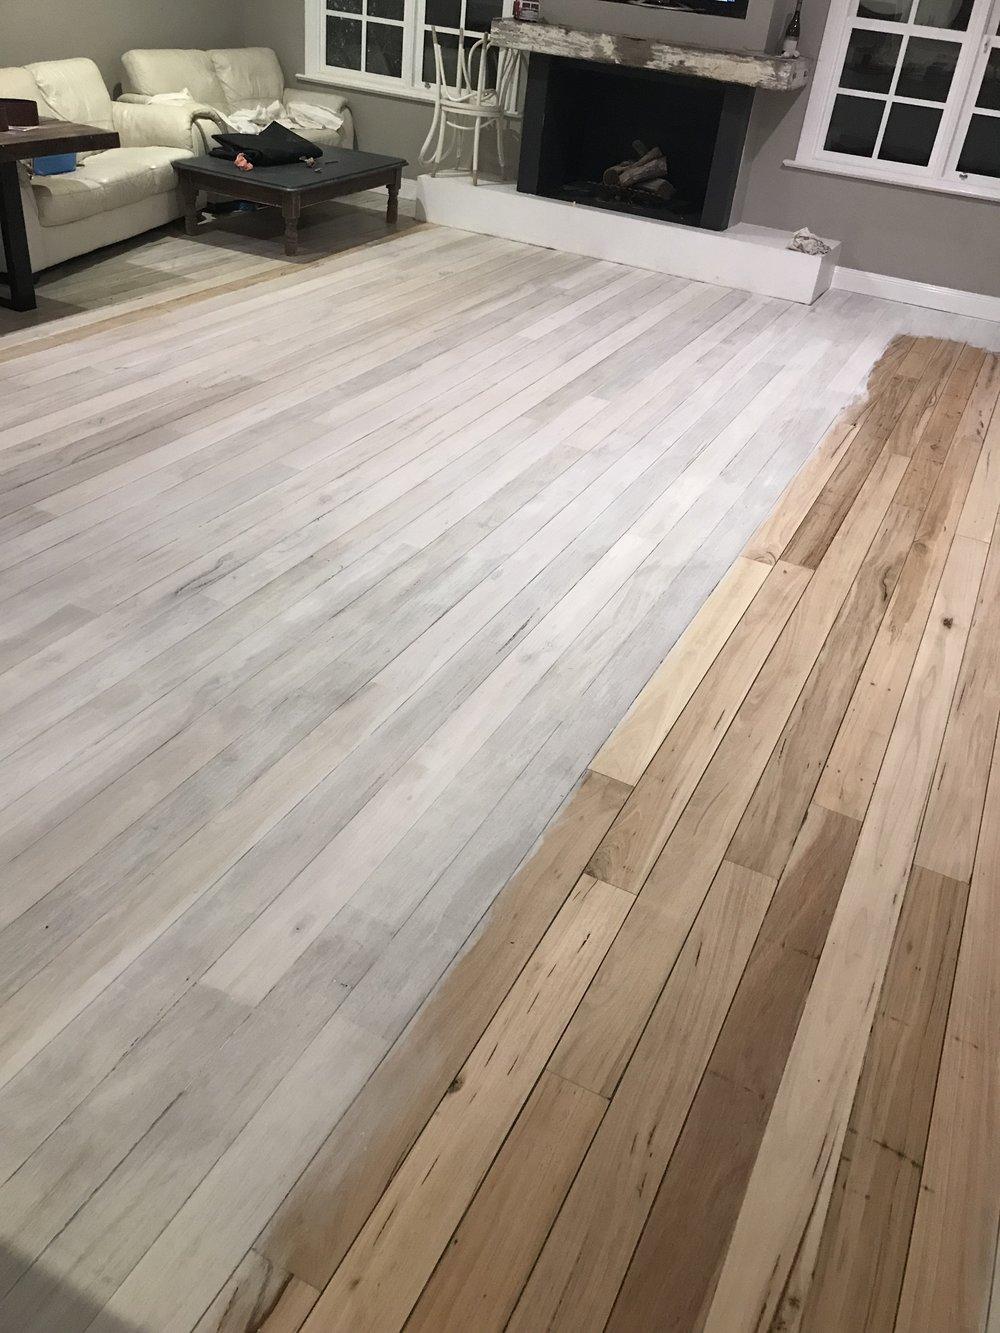 Limewash floorboards DIY Design 2 Build Interior Designer Warrnambool 3.jpg